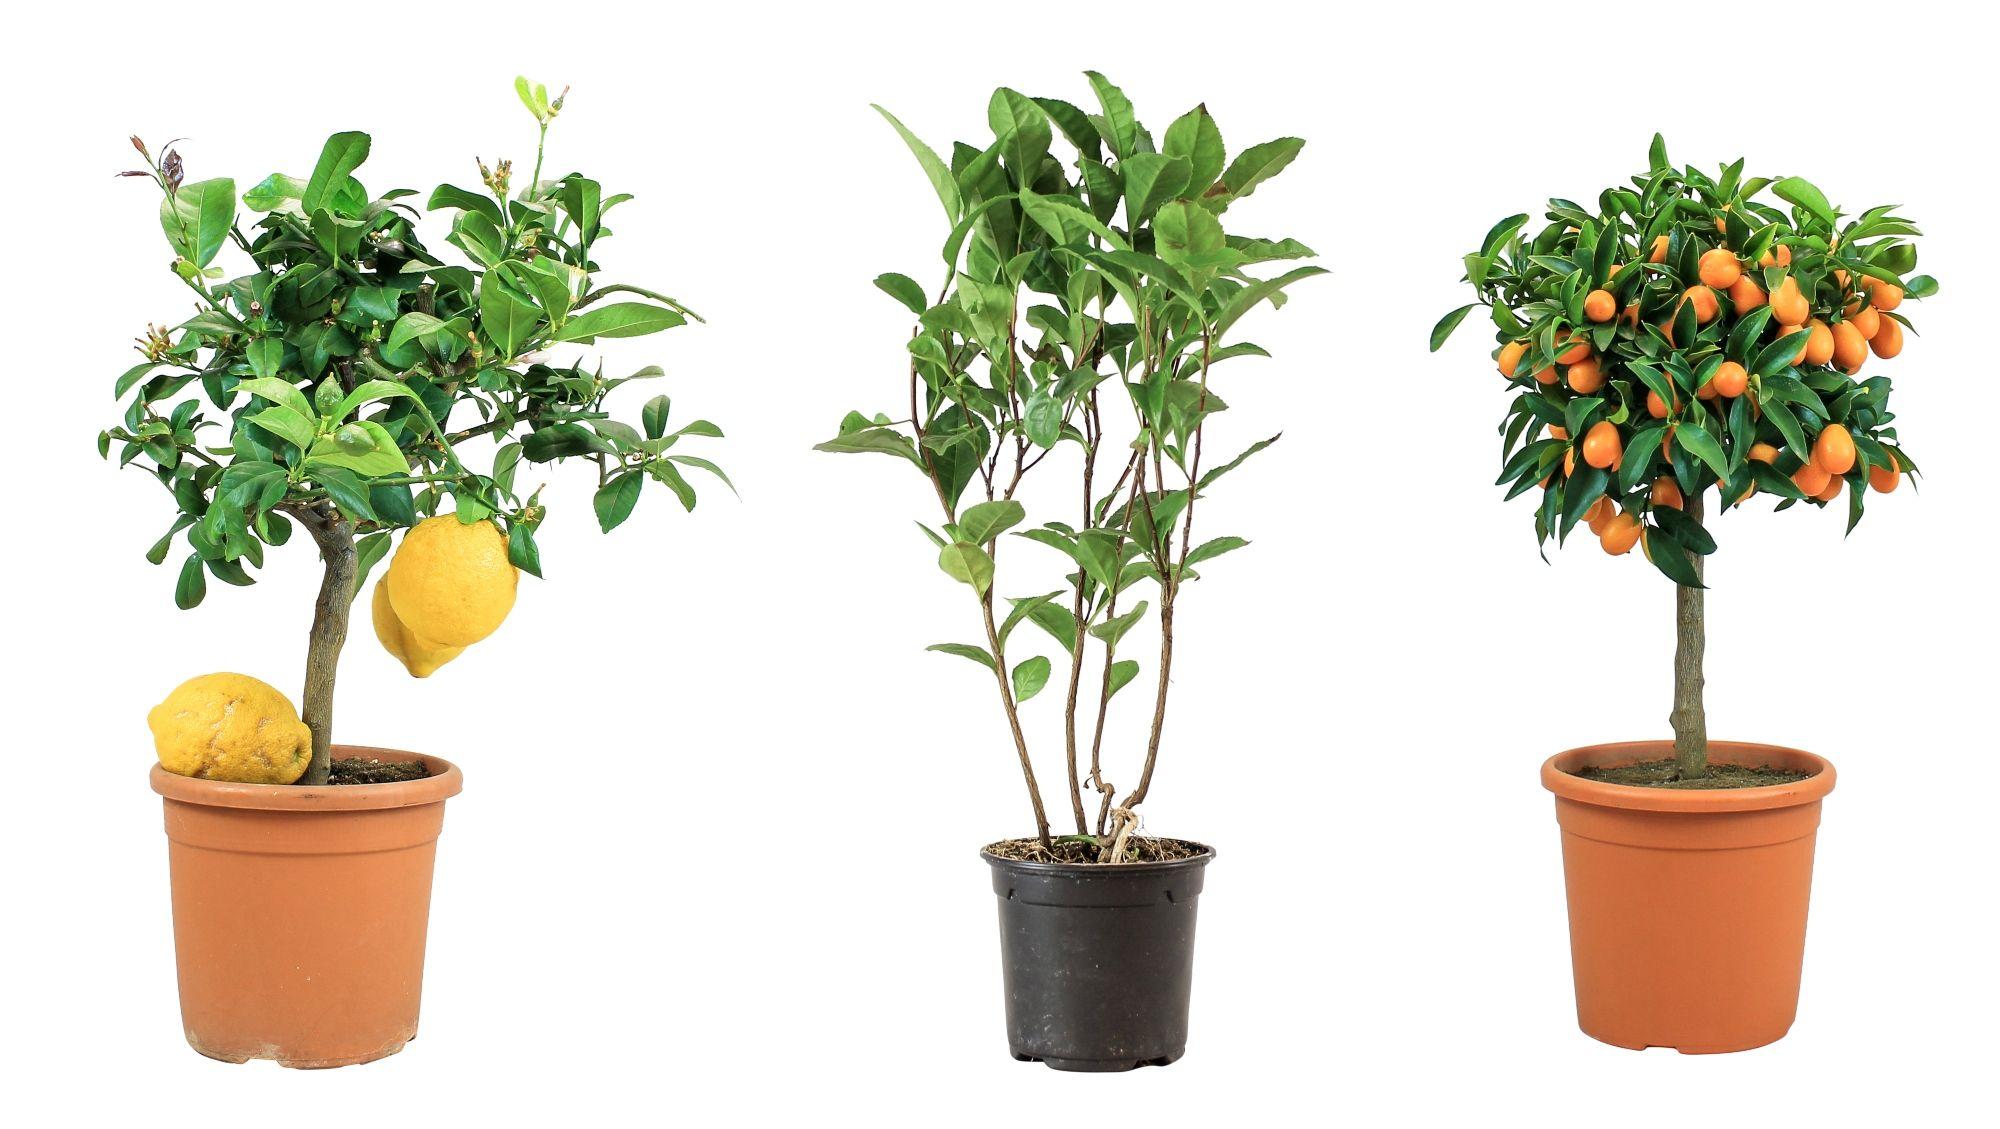 Bloombox Club launches new range of garden plants